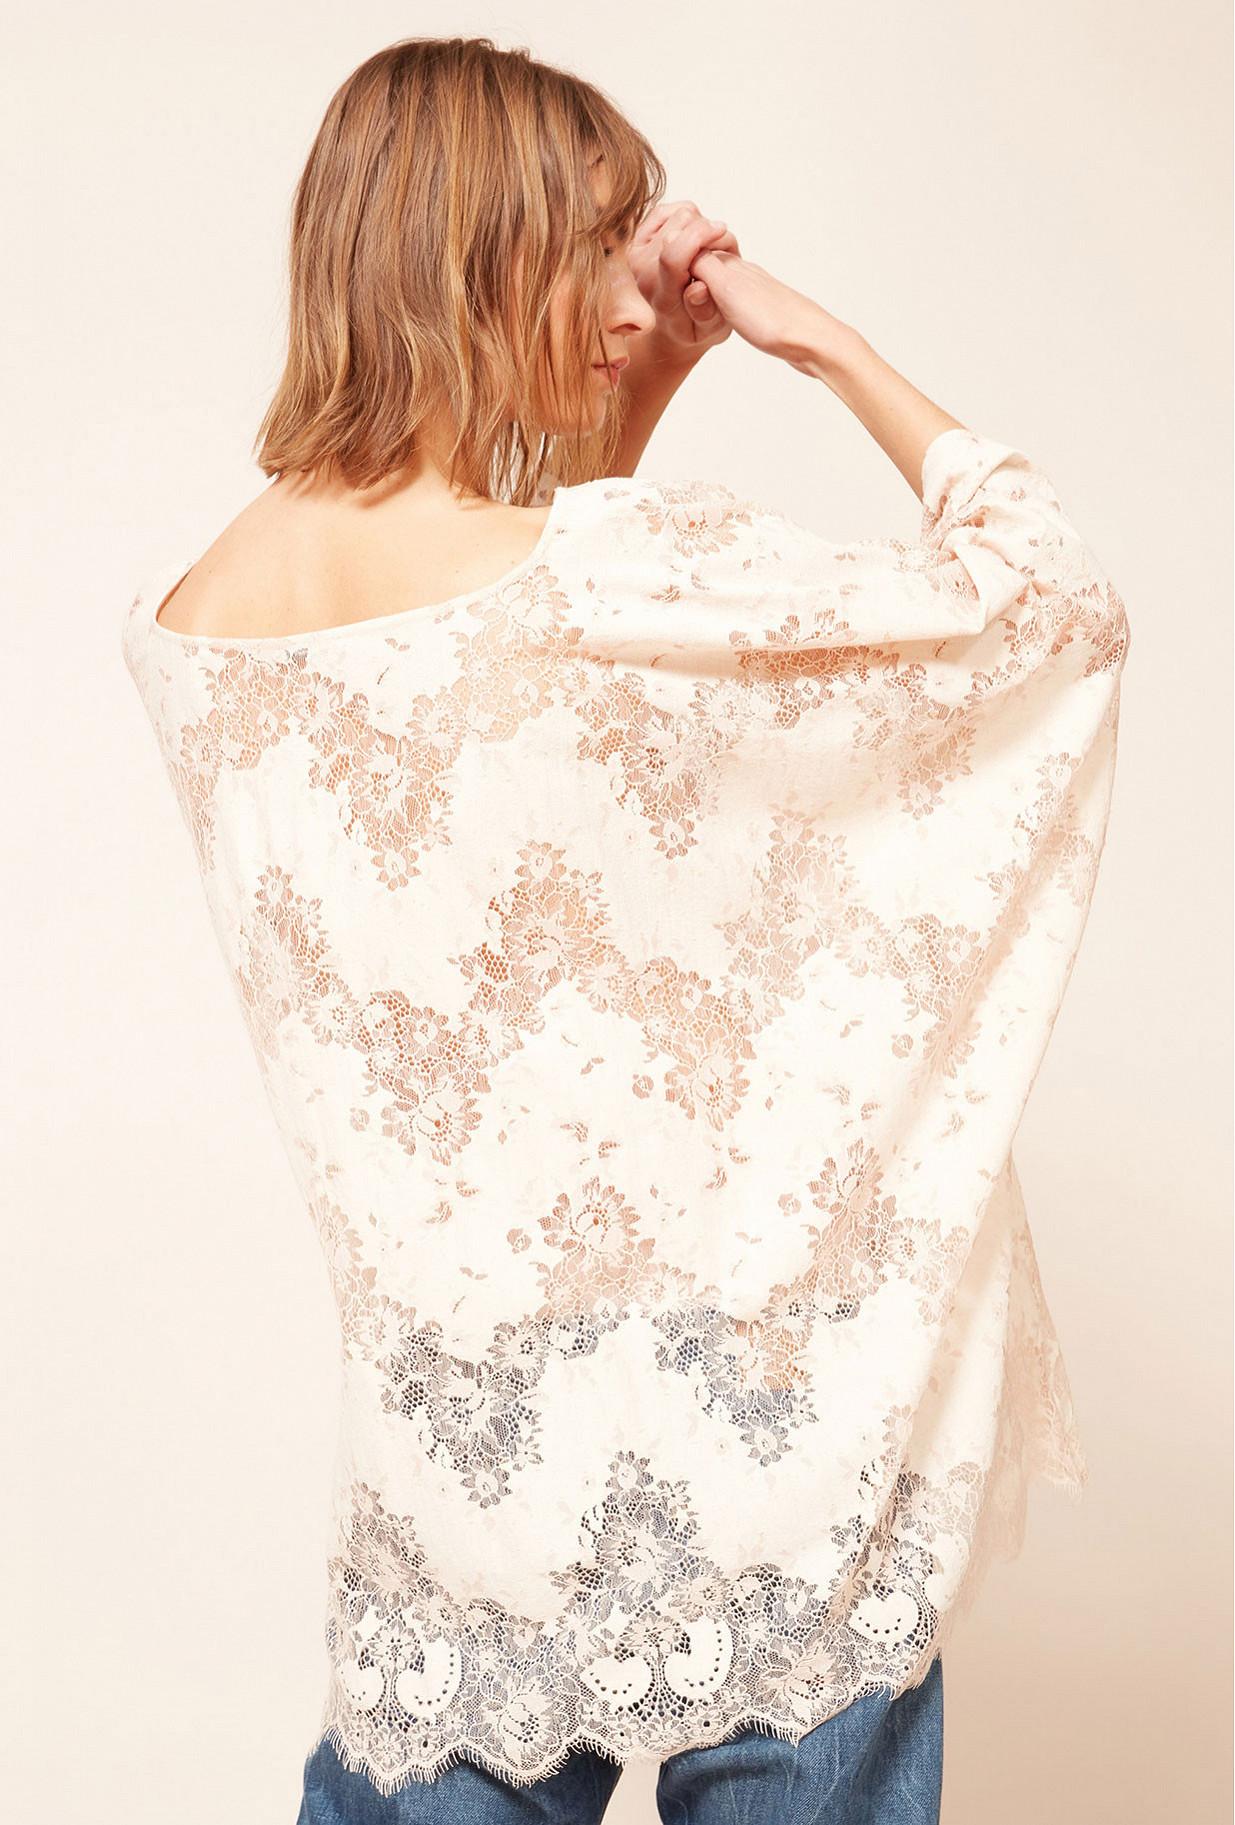 Paris clothes store Poncho  Alina french designer fashion Paris